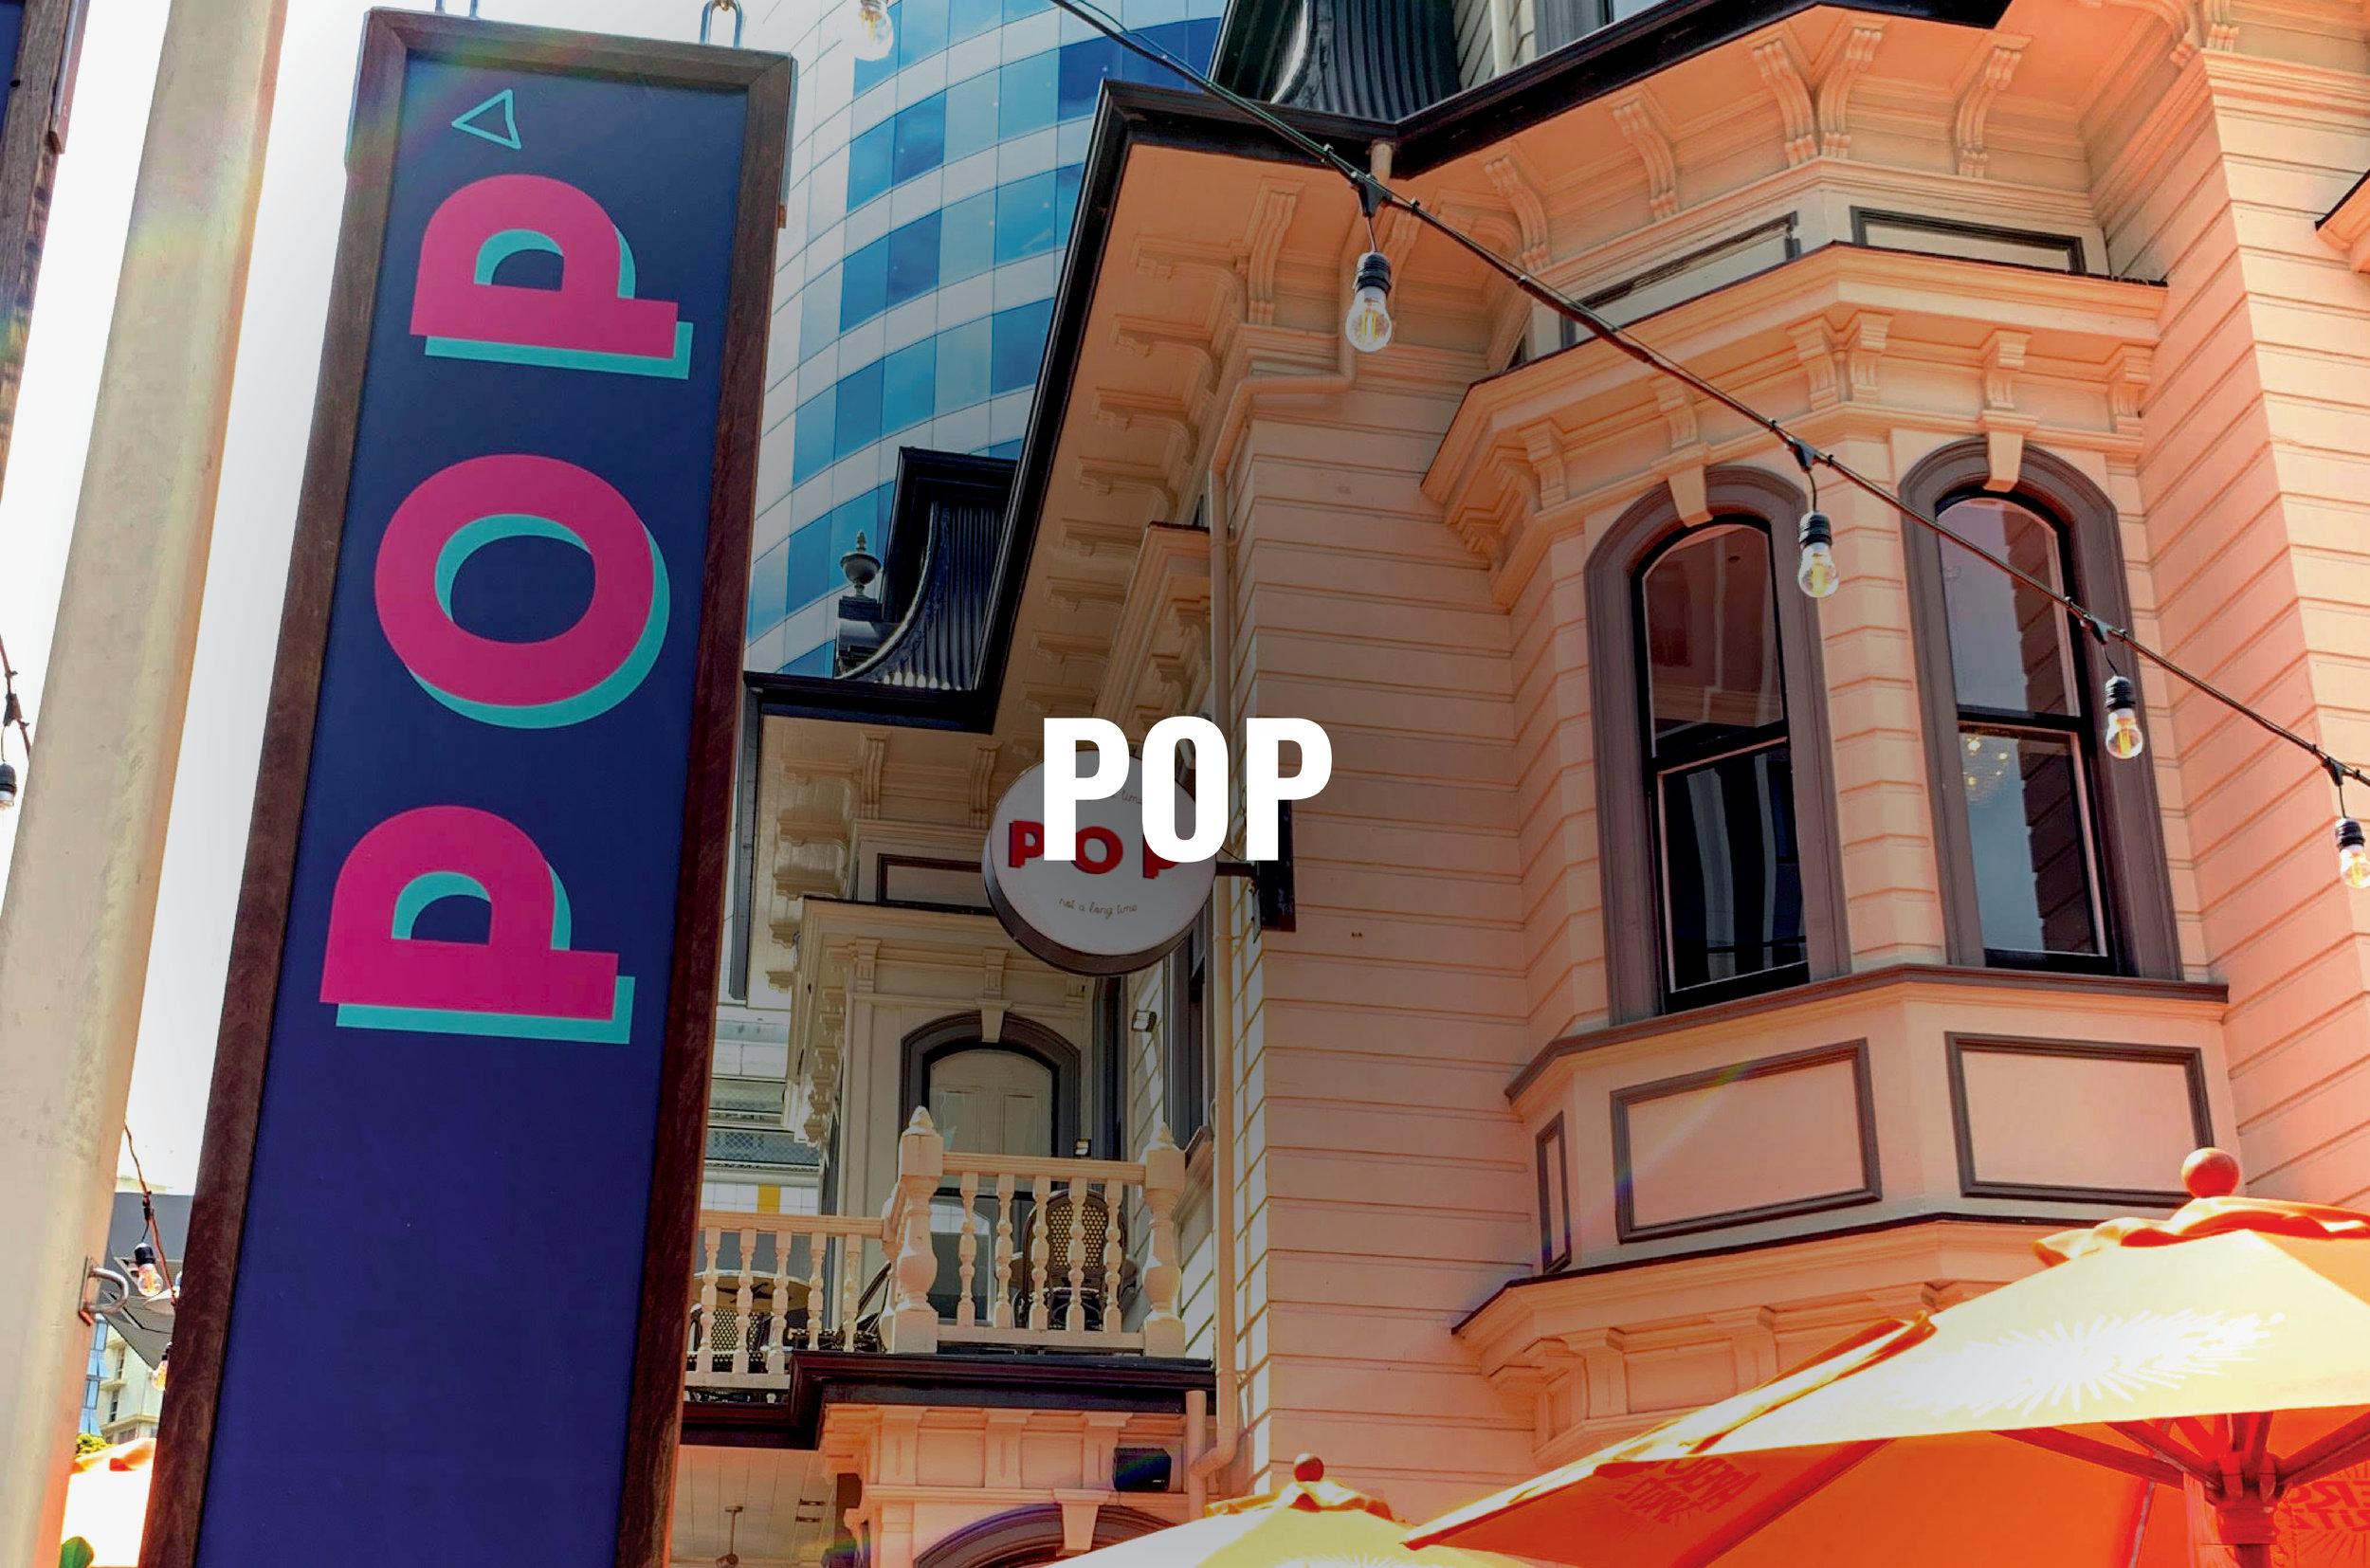 Pop web image.jpg